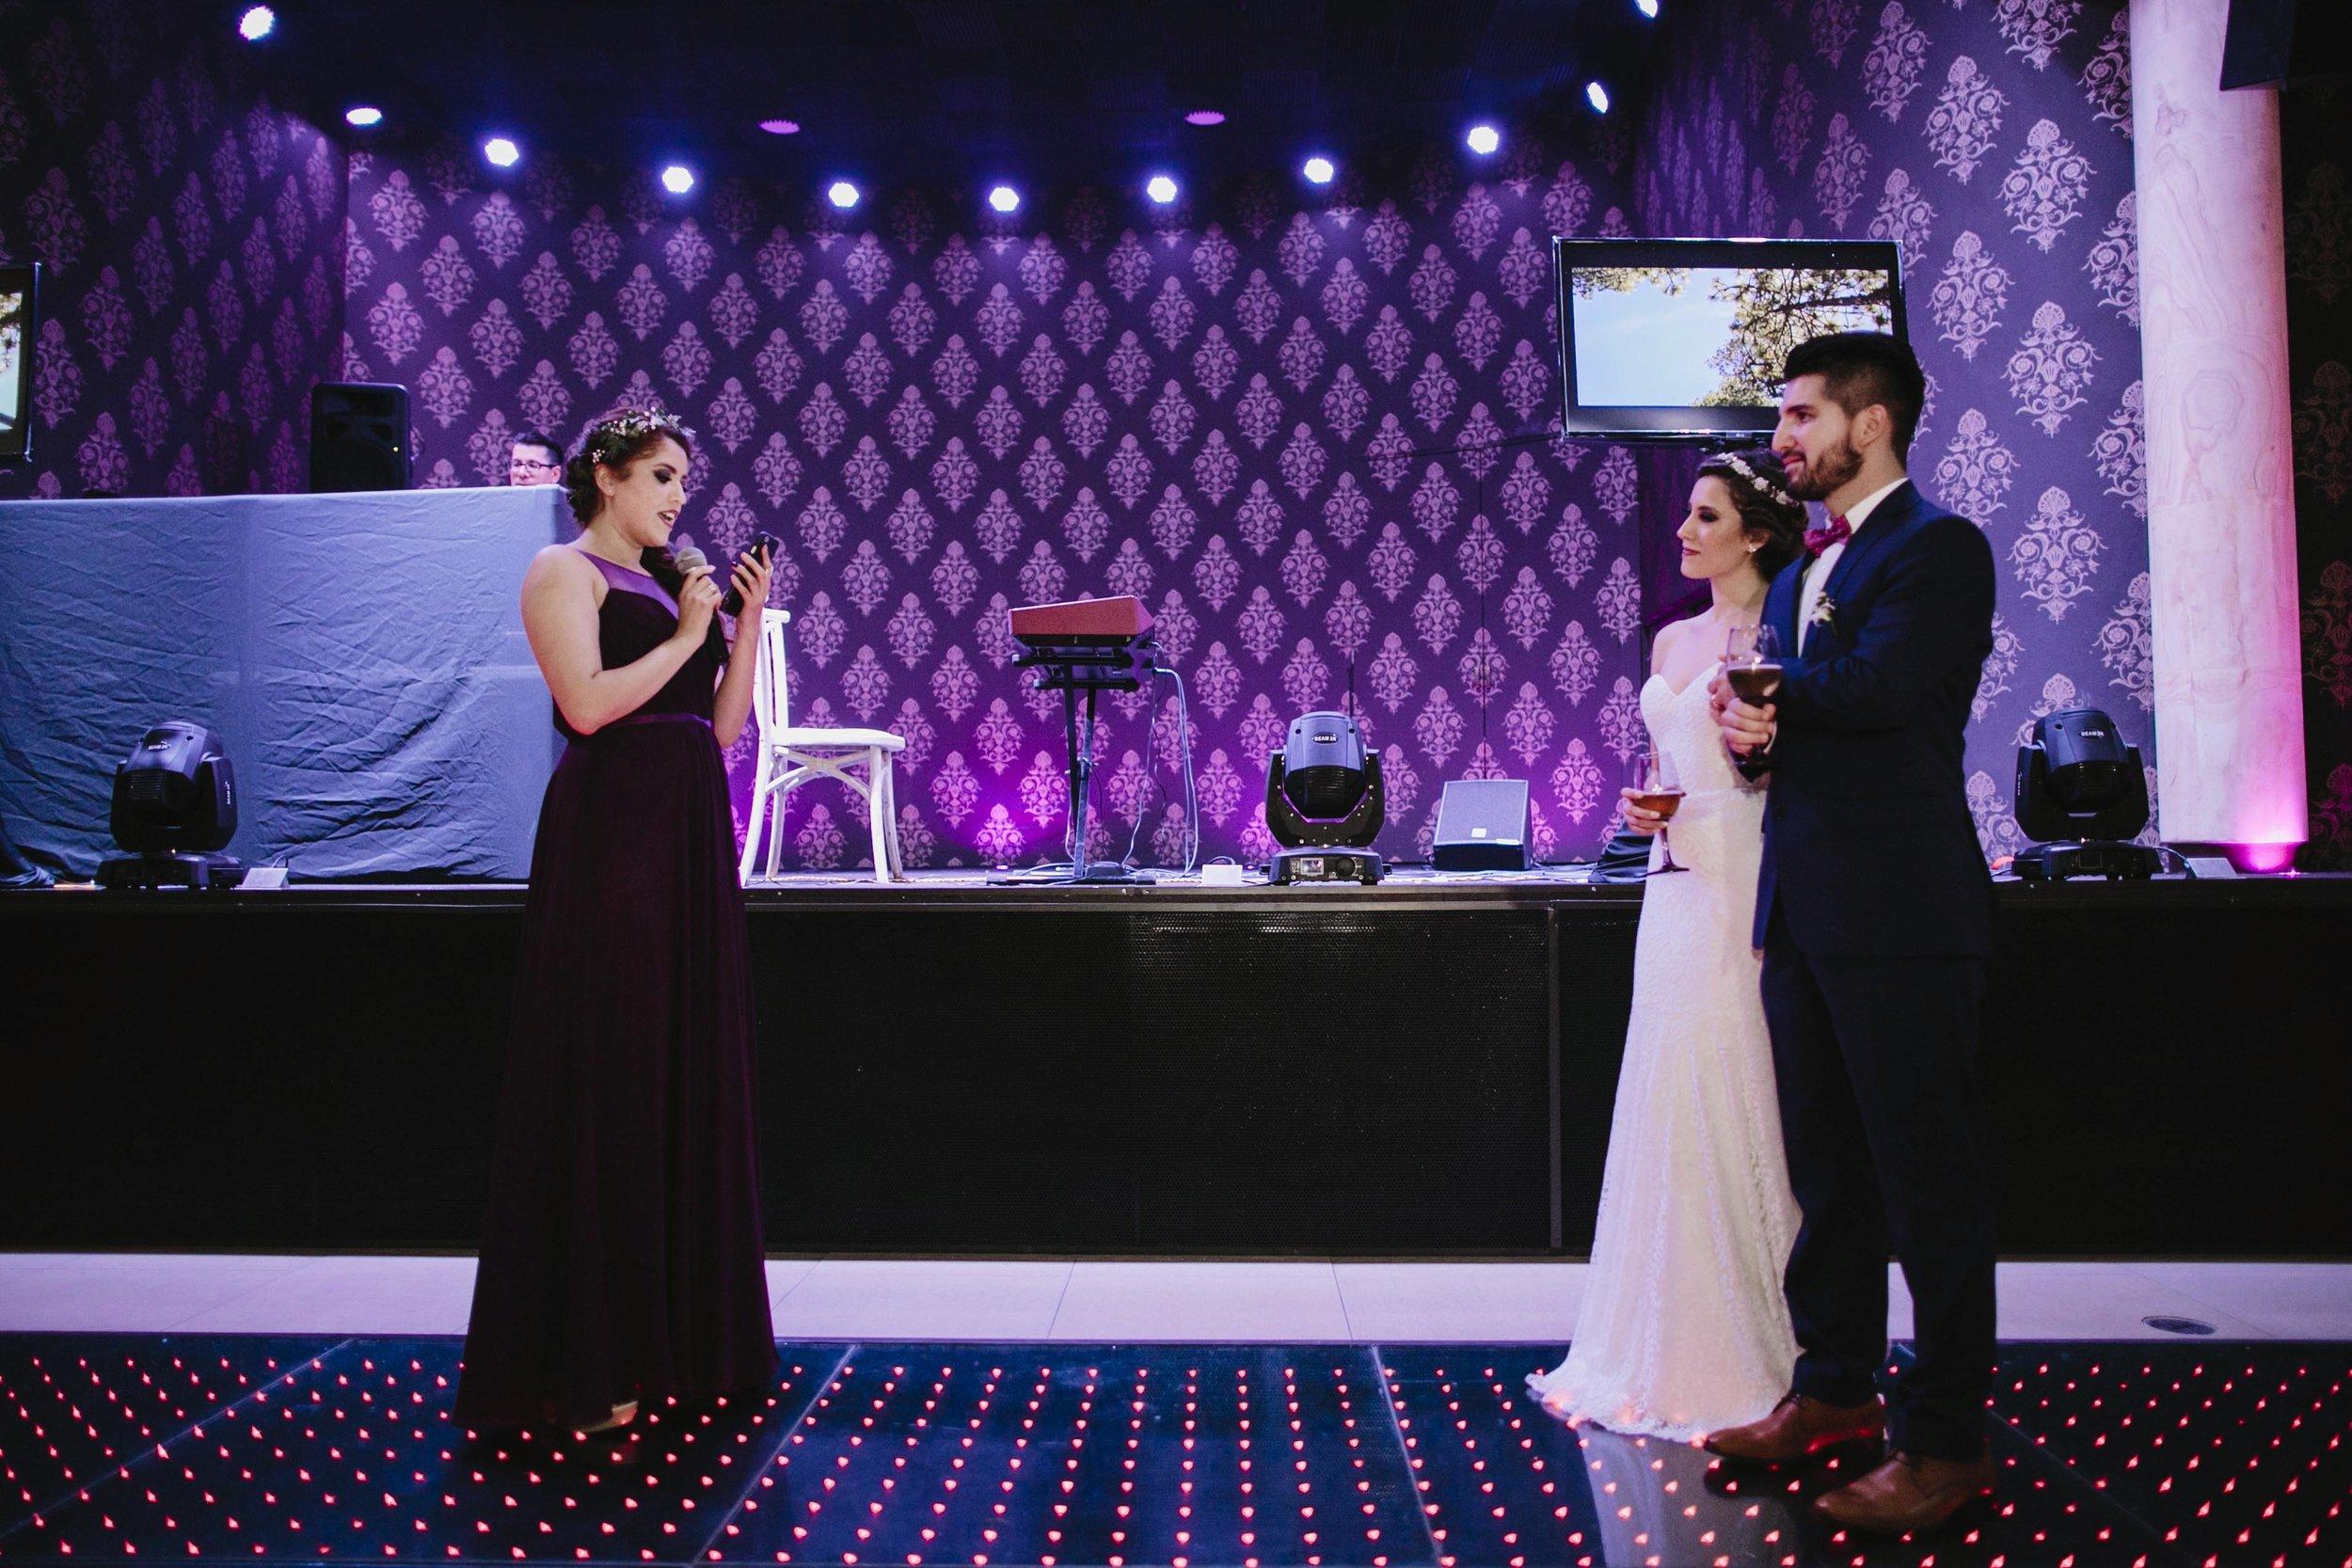 alfonso_flores_destination_wedding_photography_jardin_amarello_cuernavaca1.jpg